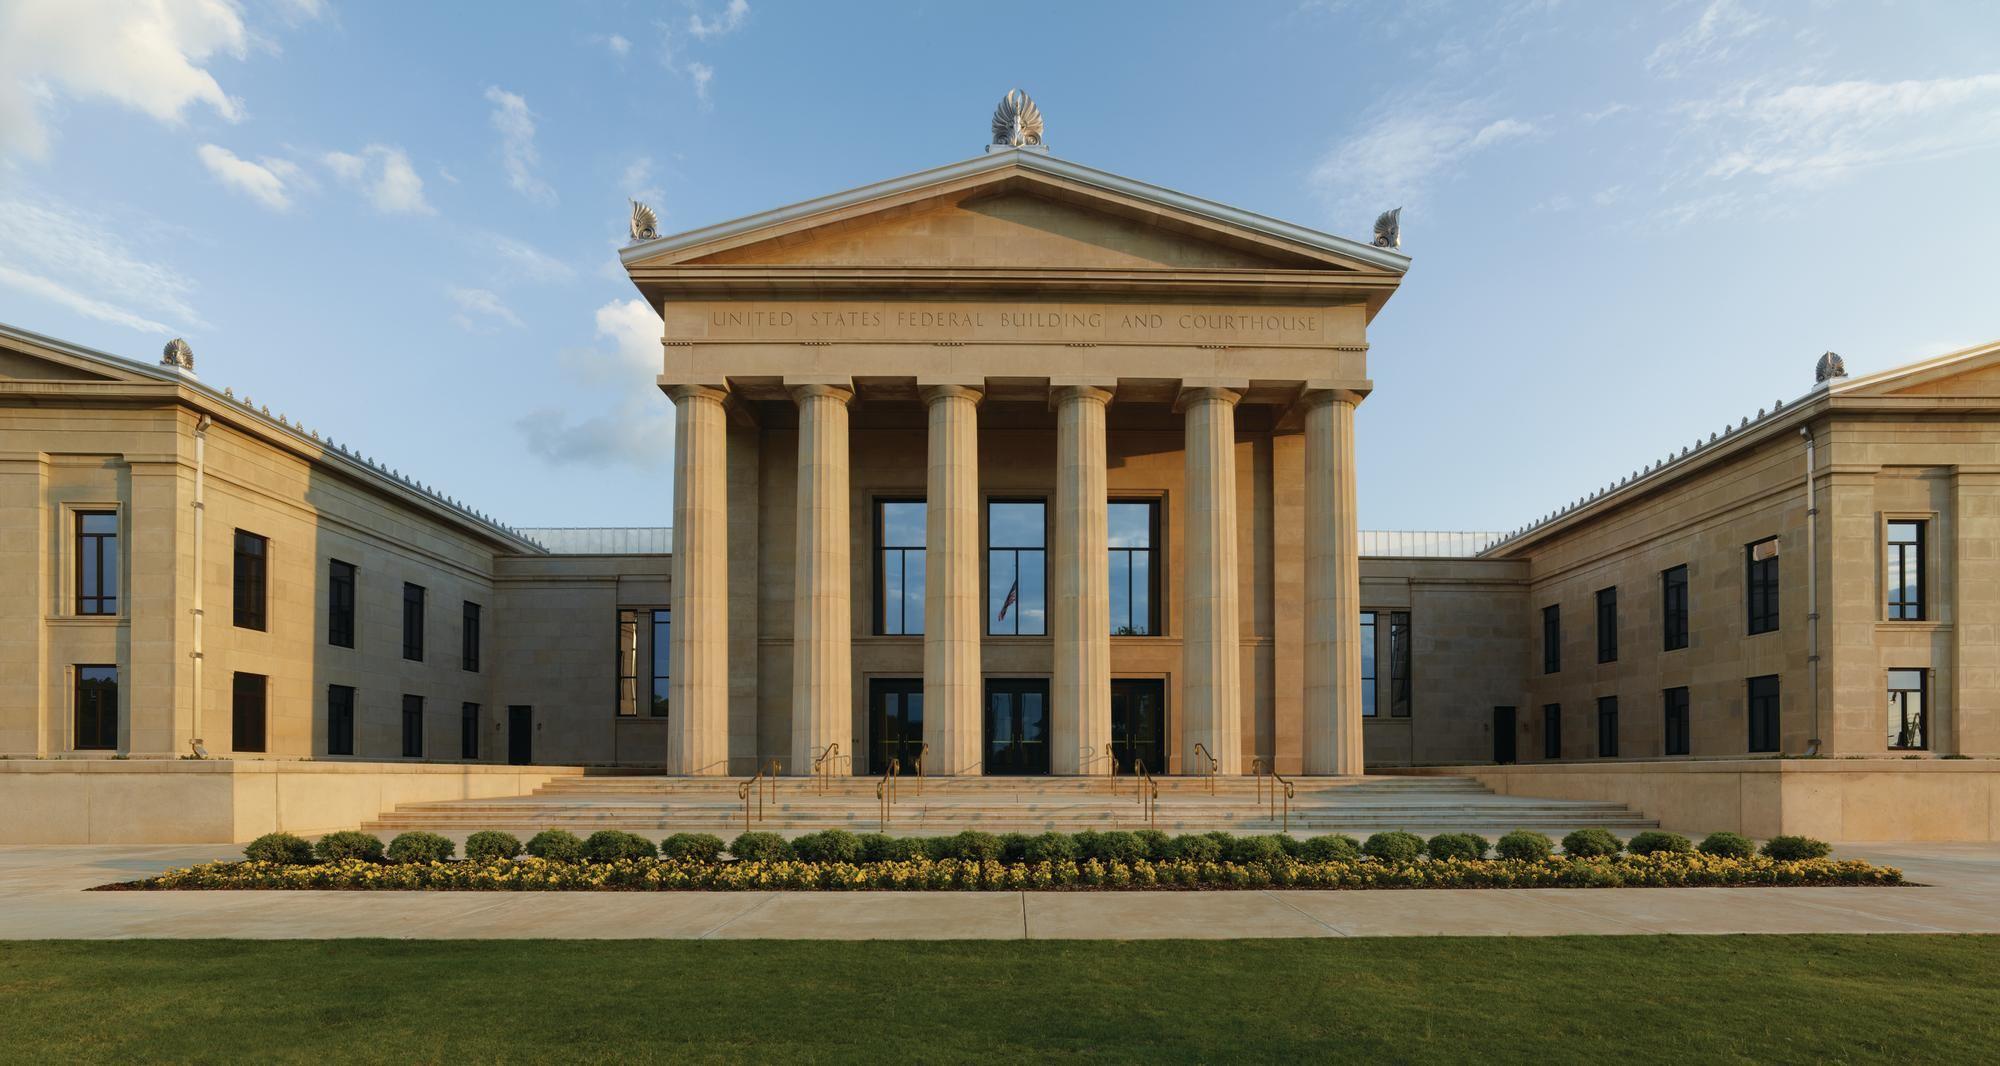 tuscaloosa federal building and courthouse architect magazine